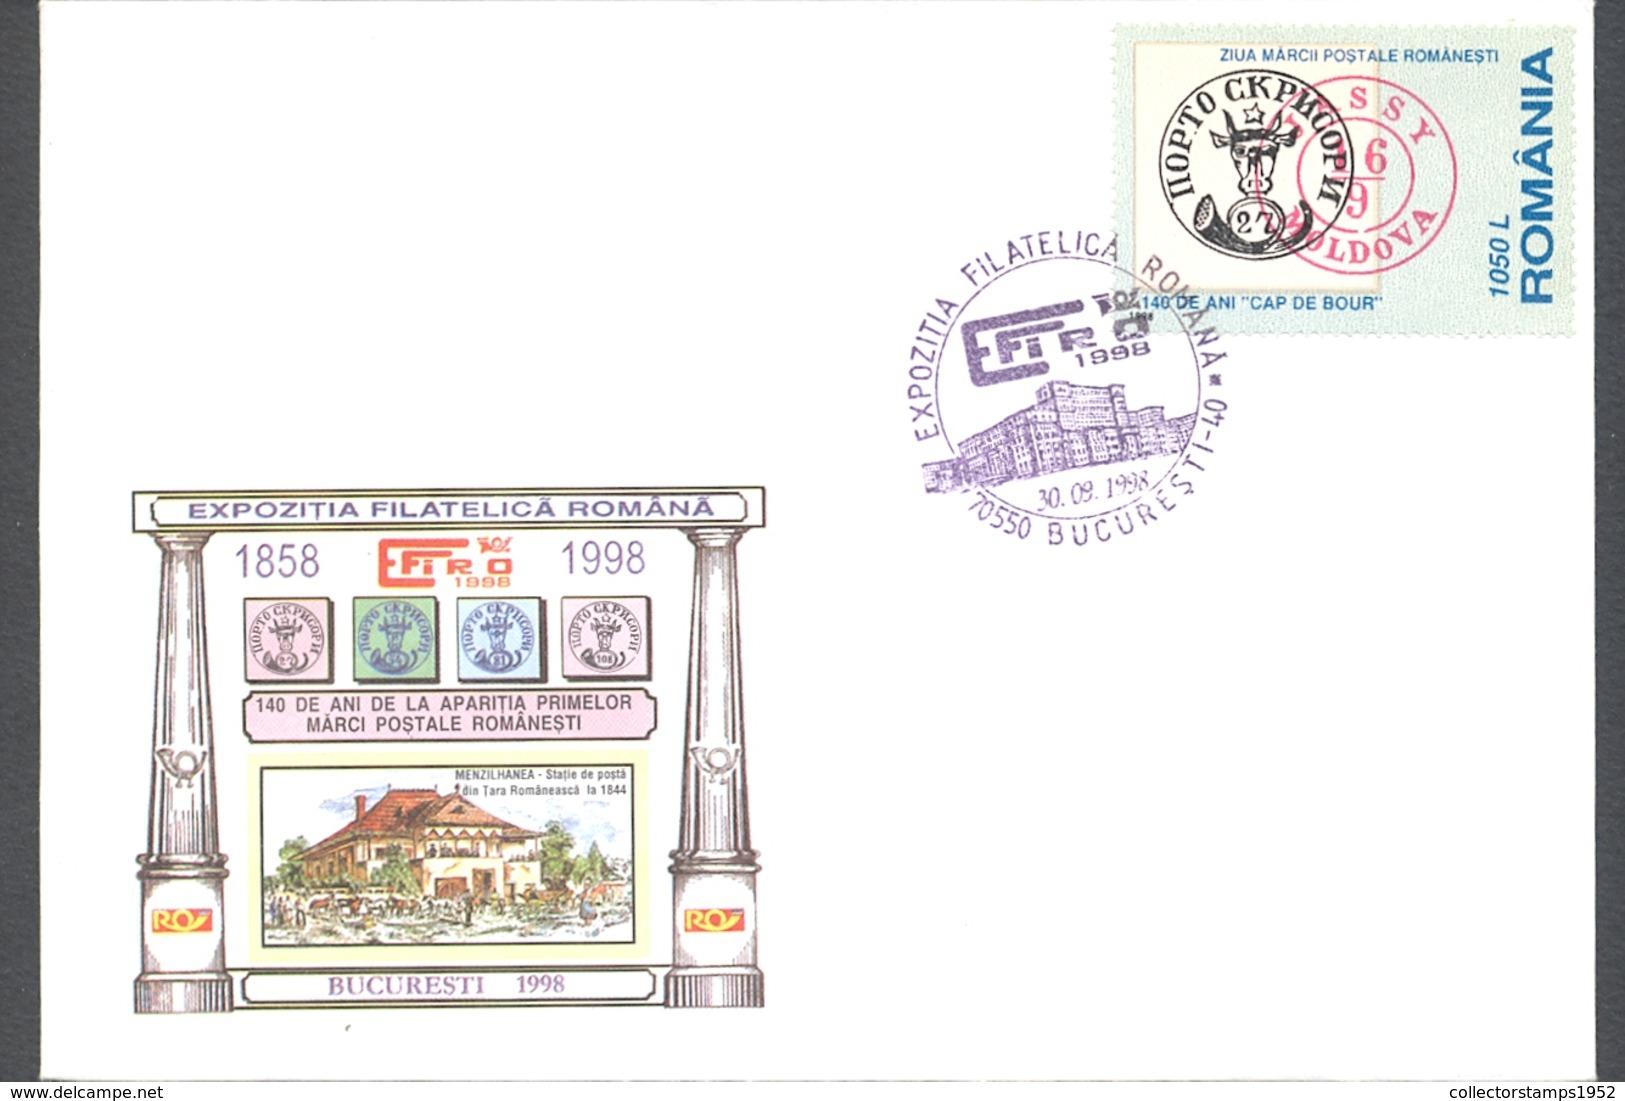 75837- BUCHAREST- EFIRO PHILATELIC EXHIBITION, ROMANIAN STAMP'S DAY, SPECIAL COVER, 1998, ROMANIA - 1948-.... Républiques